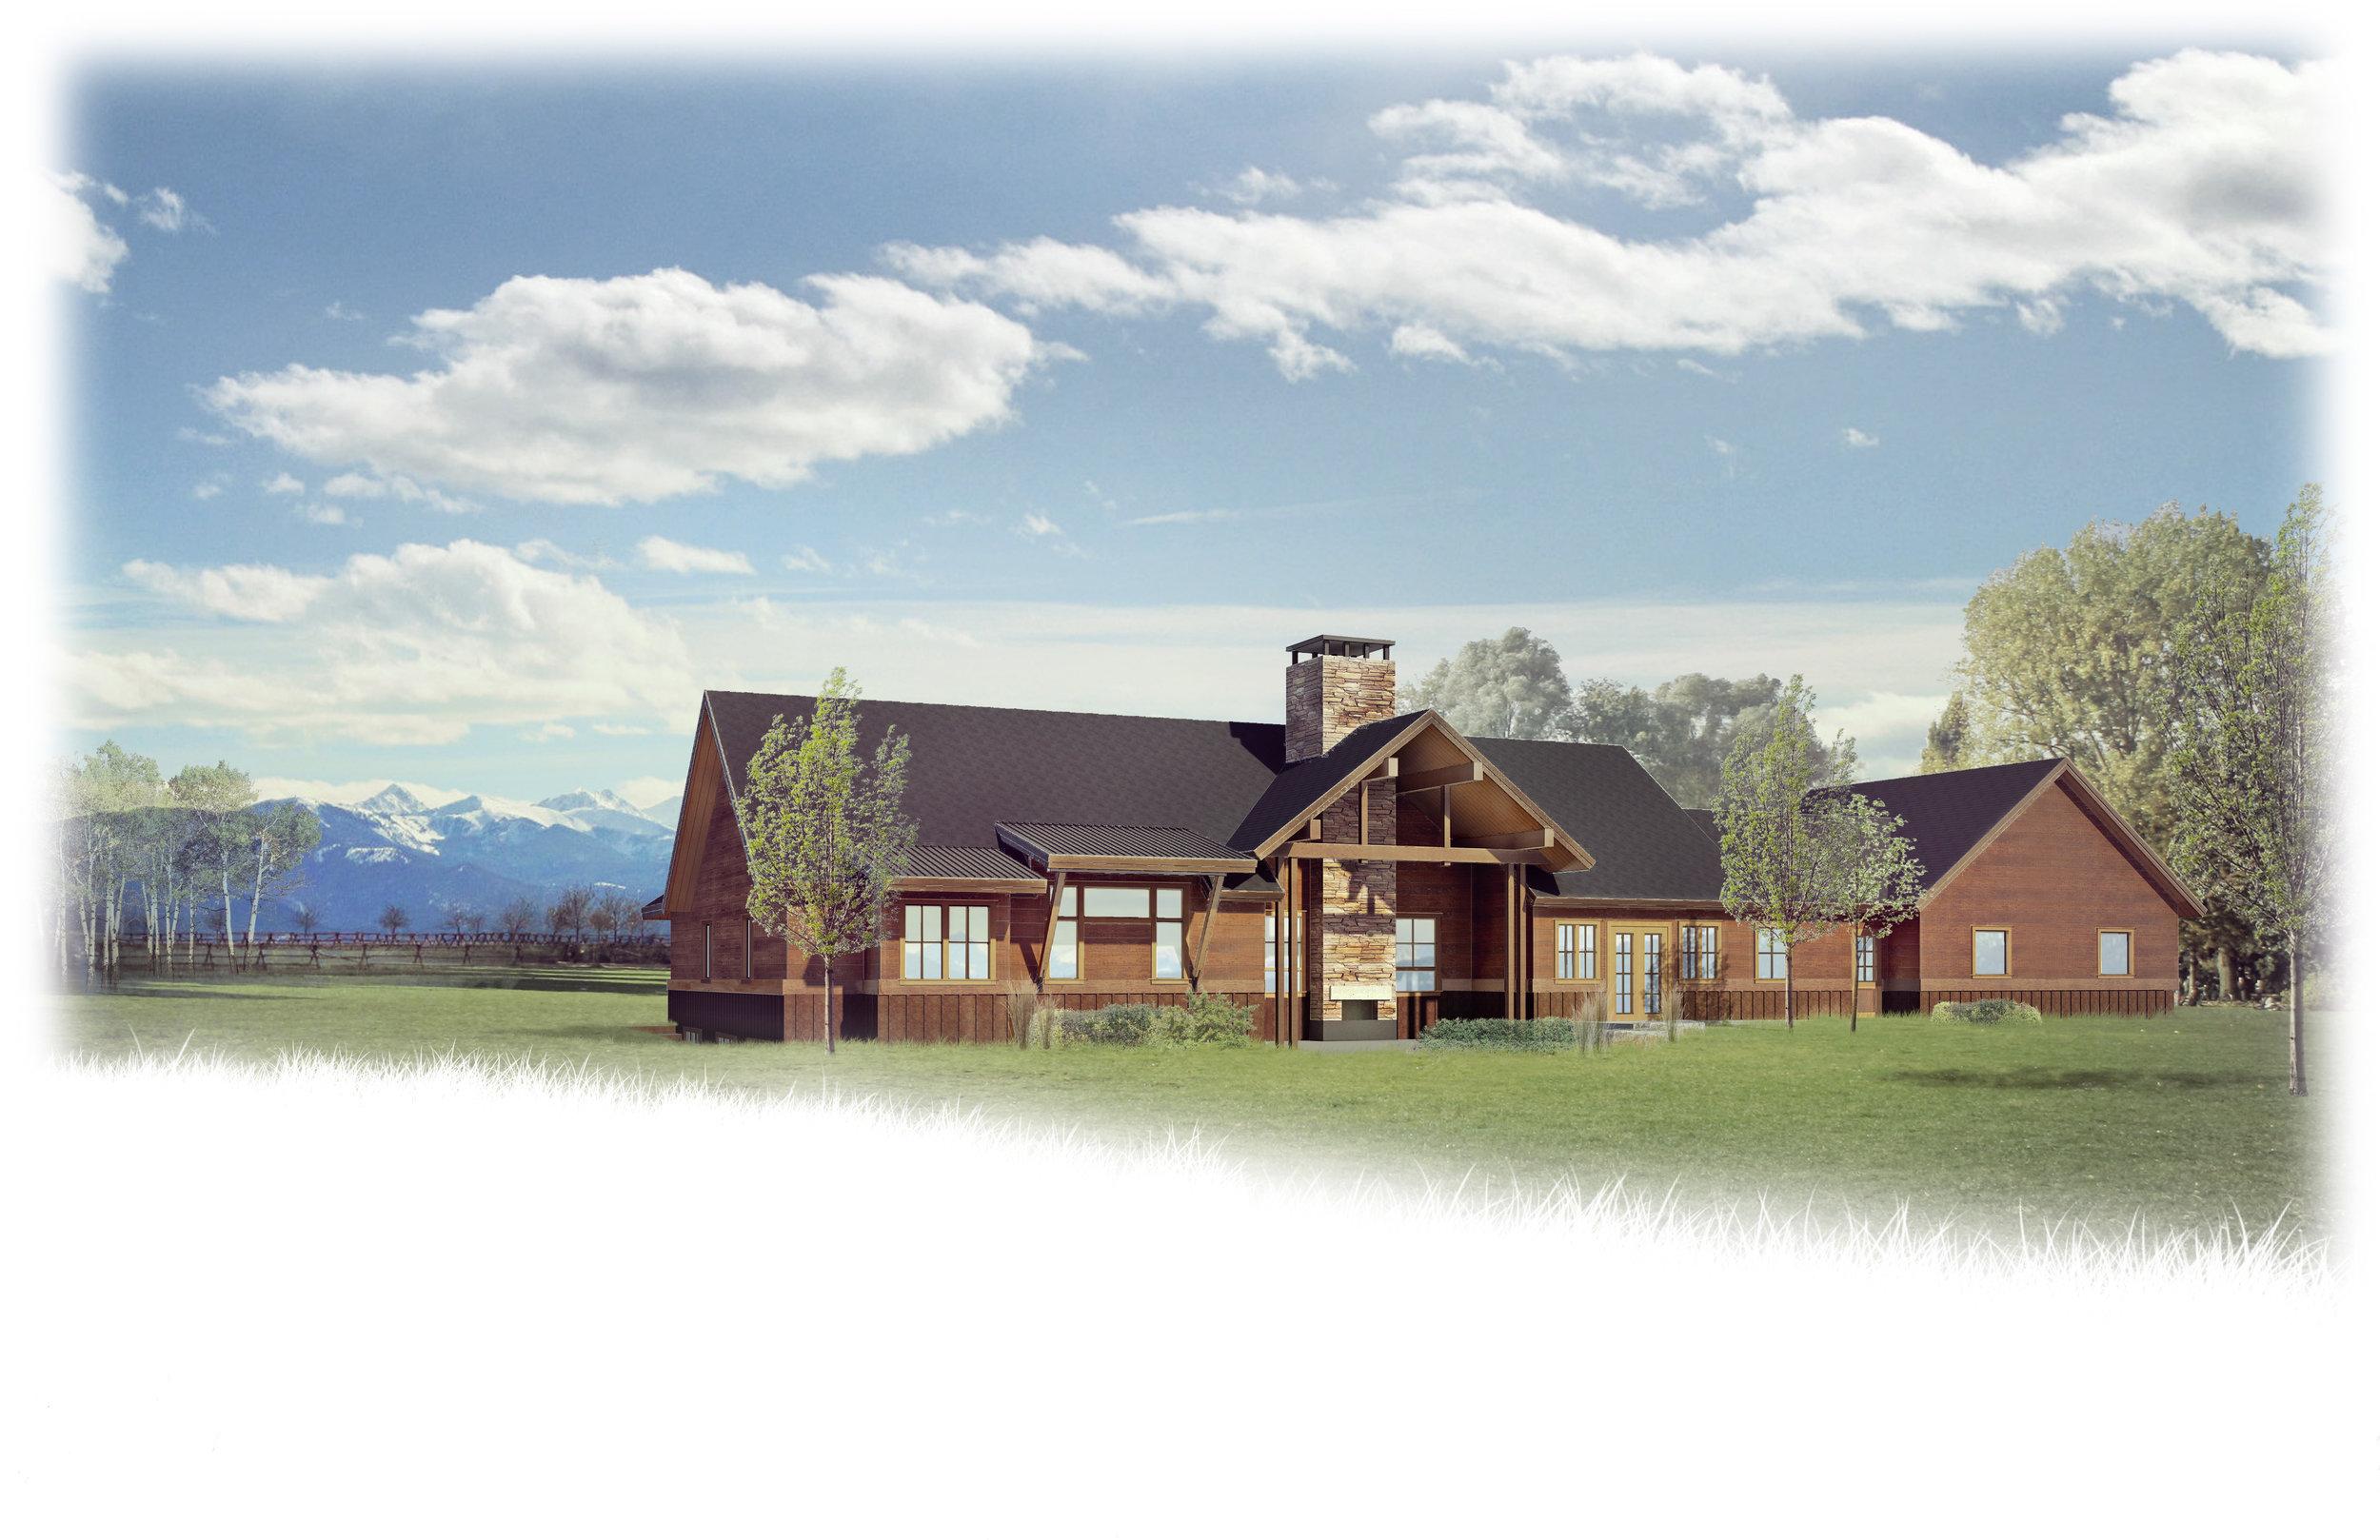 Campbell Residence revised 5.26 (1).jpg